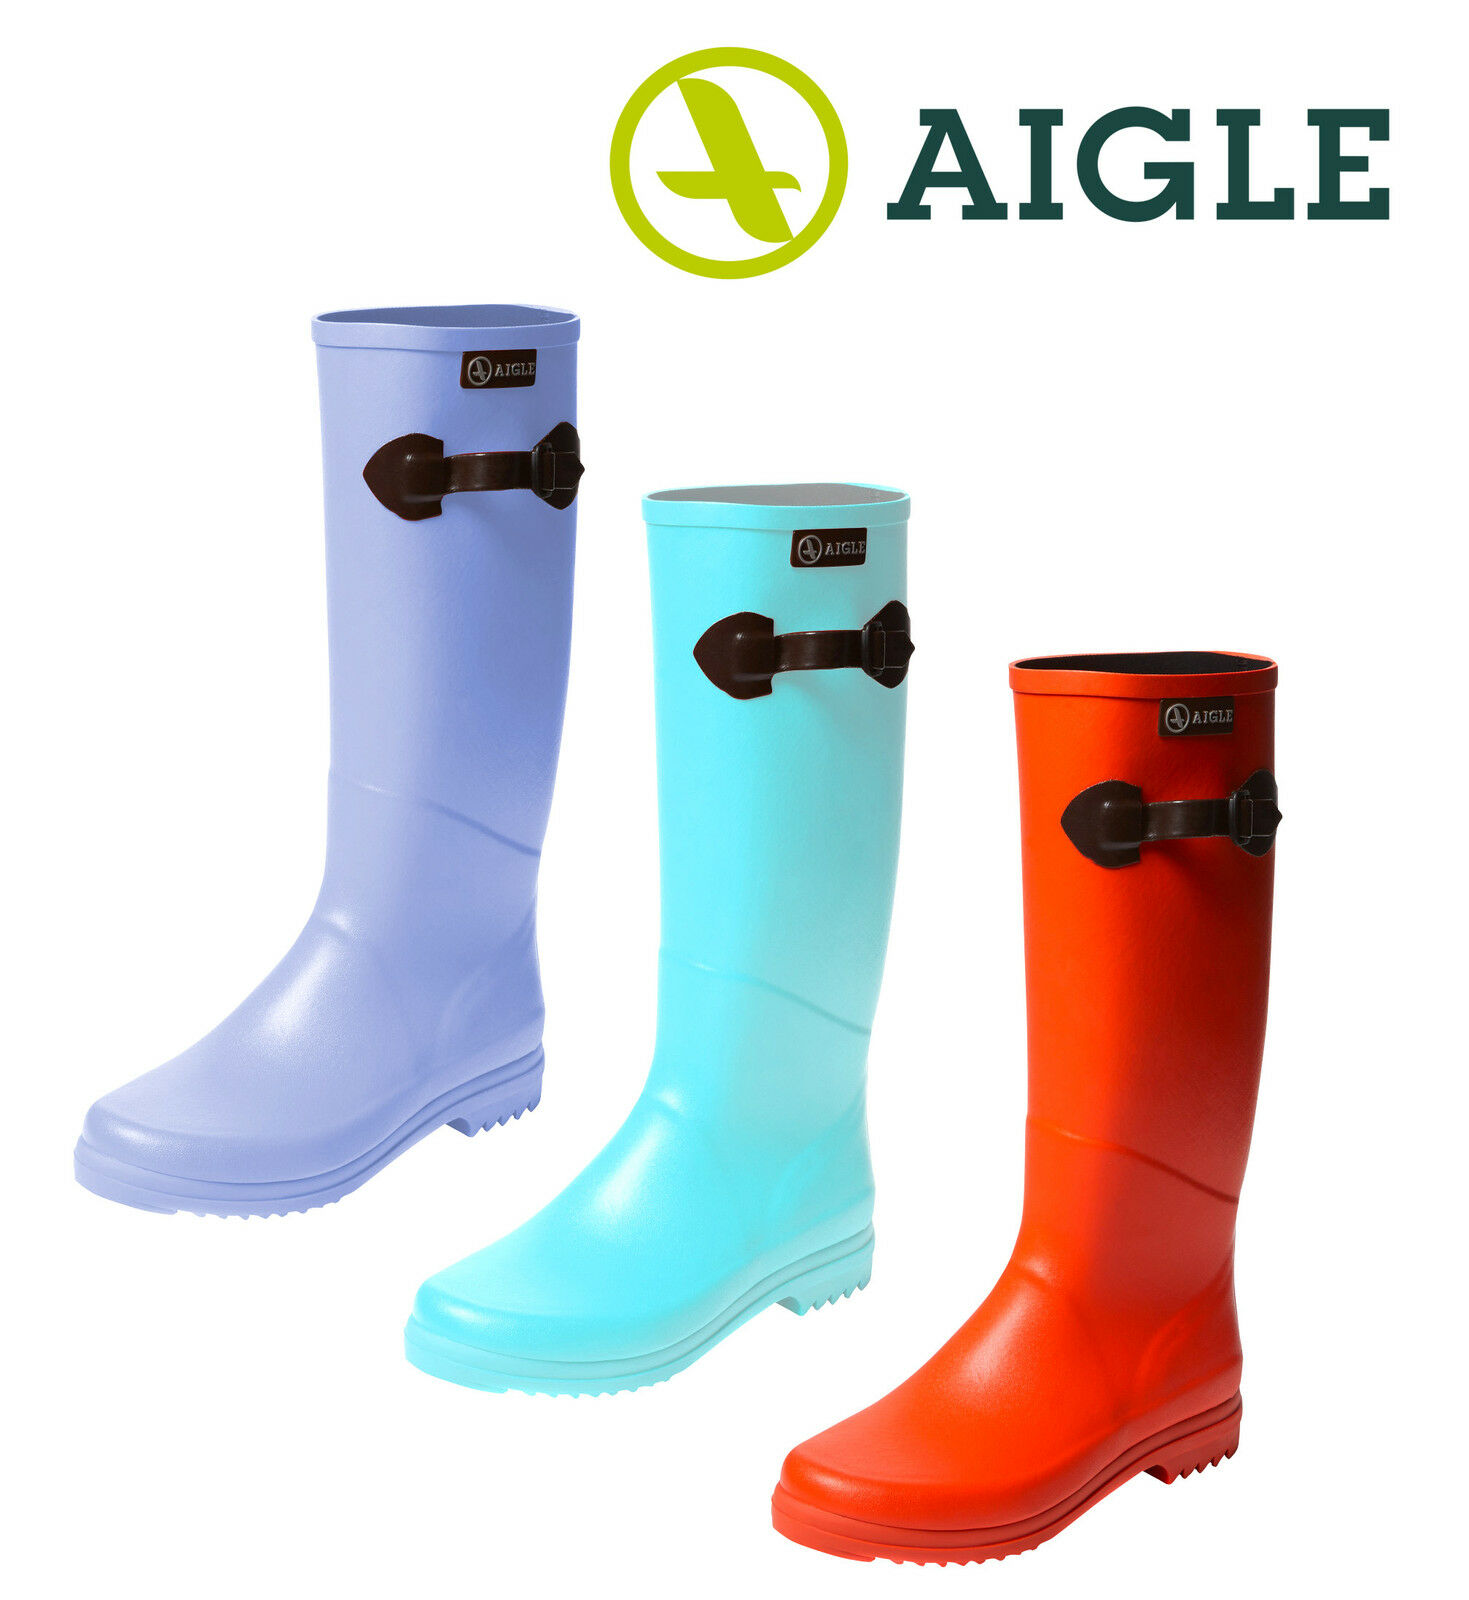 Aigle Chantebelle Pop Stiefel Gummistiefel Coole Farben Outdoor Herbst Geschenk